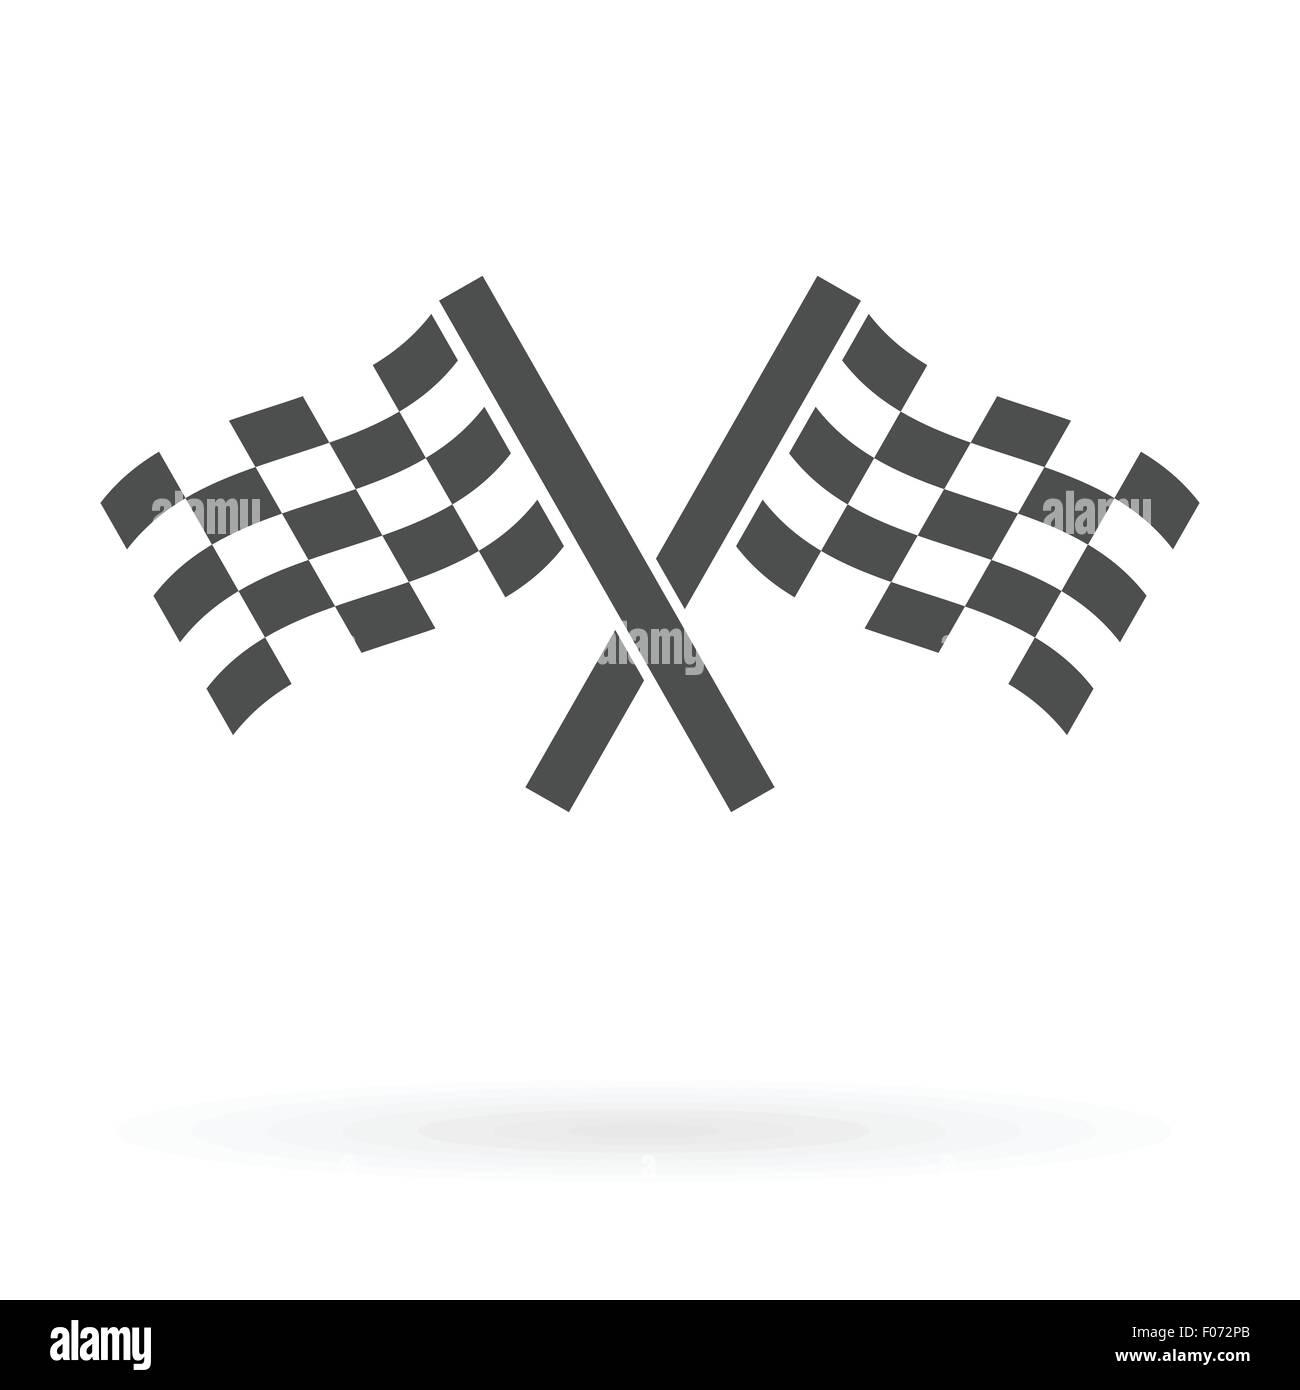 gekreuzte Autosport Finish Flaggen Symbol isoliert Design Vektor-illustration Stockbild